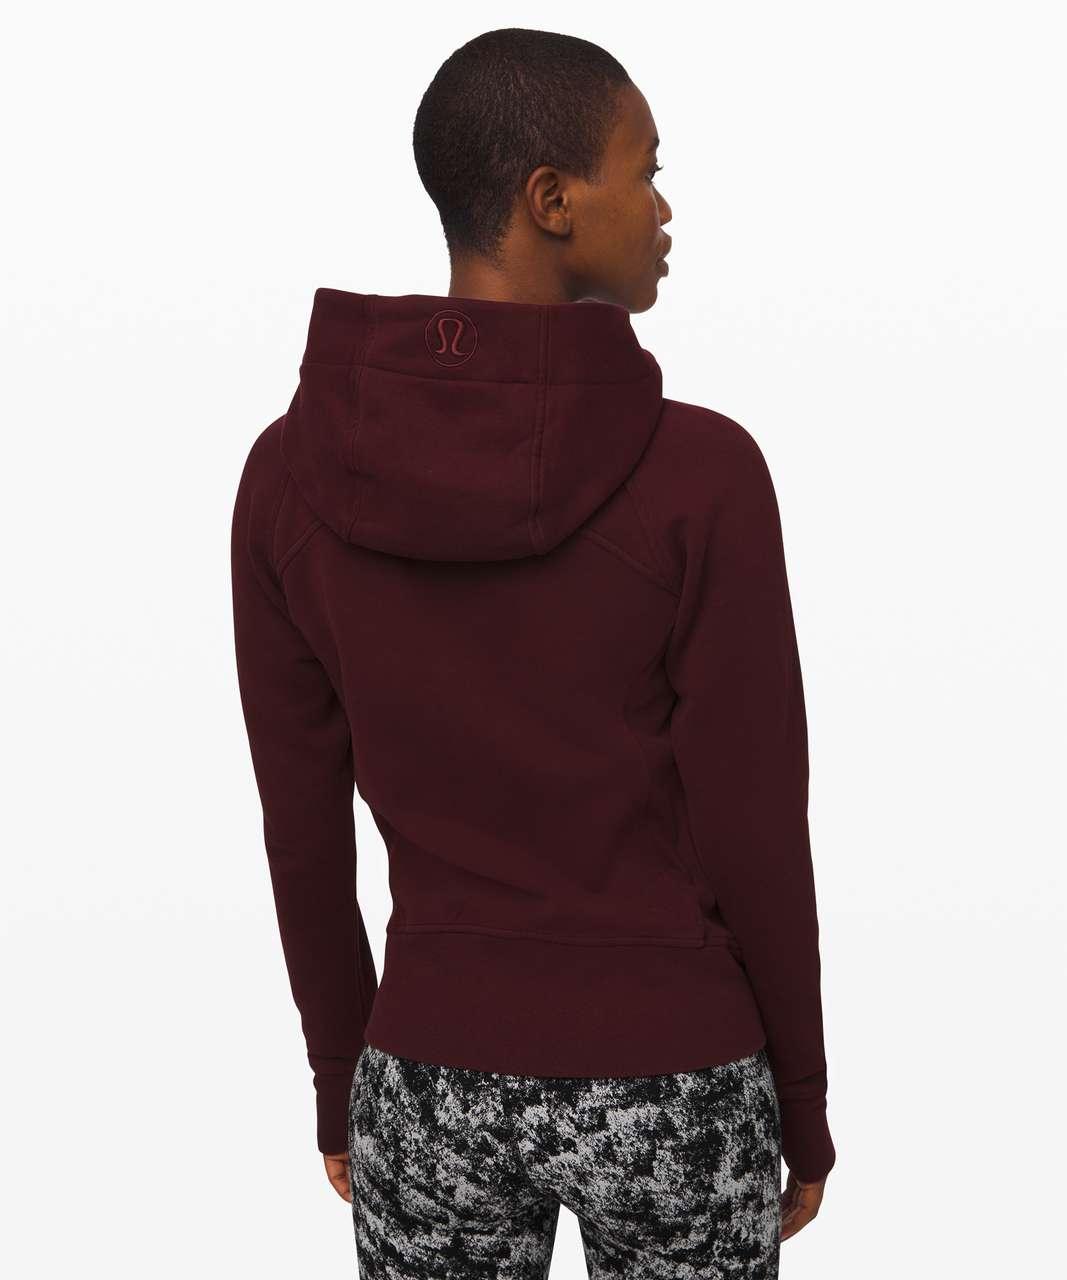 Lululemon Scuba Hoodie *Light Cotton Fleece - Garnet